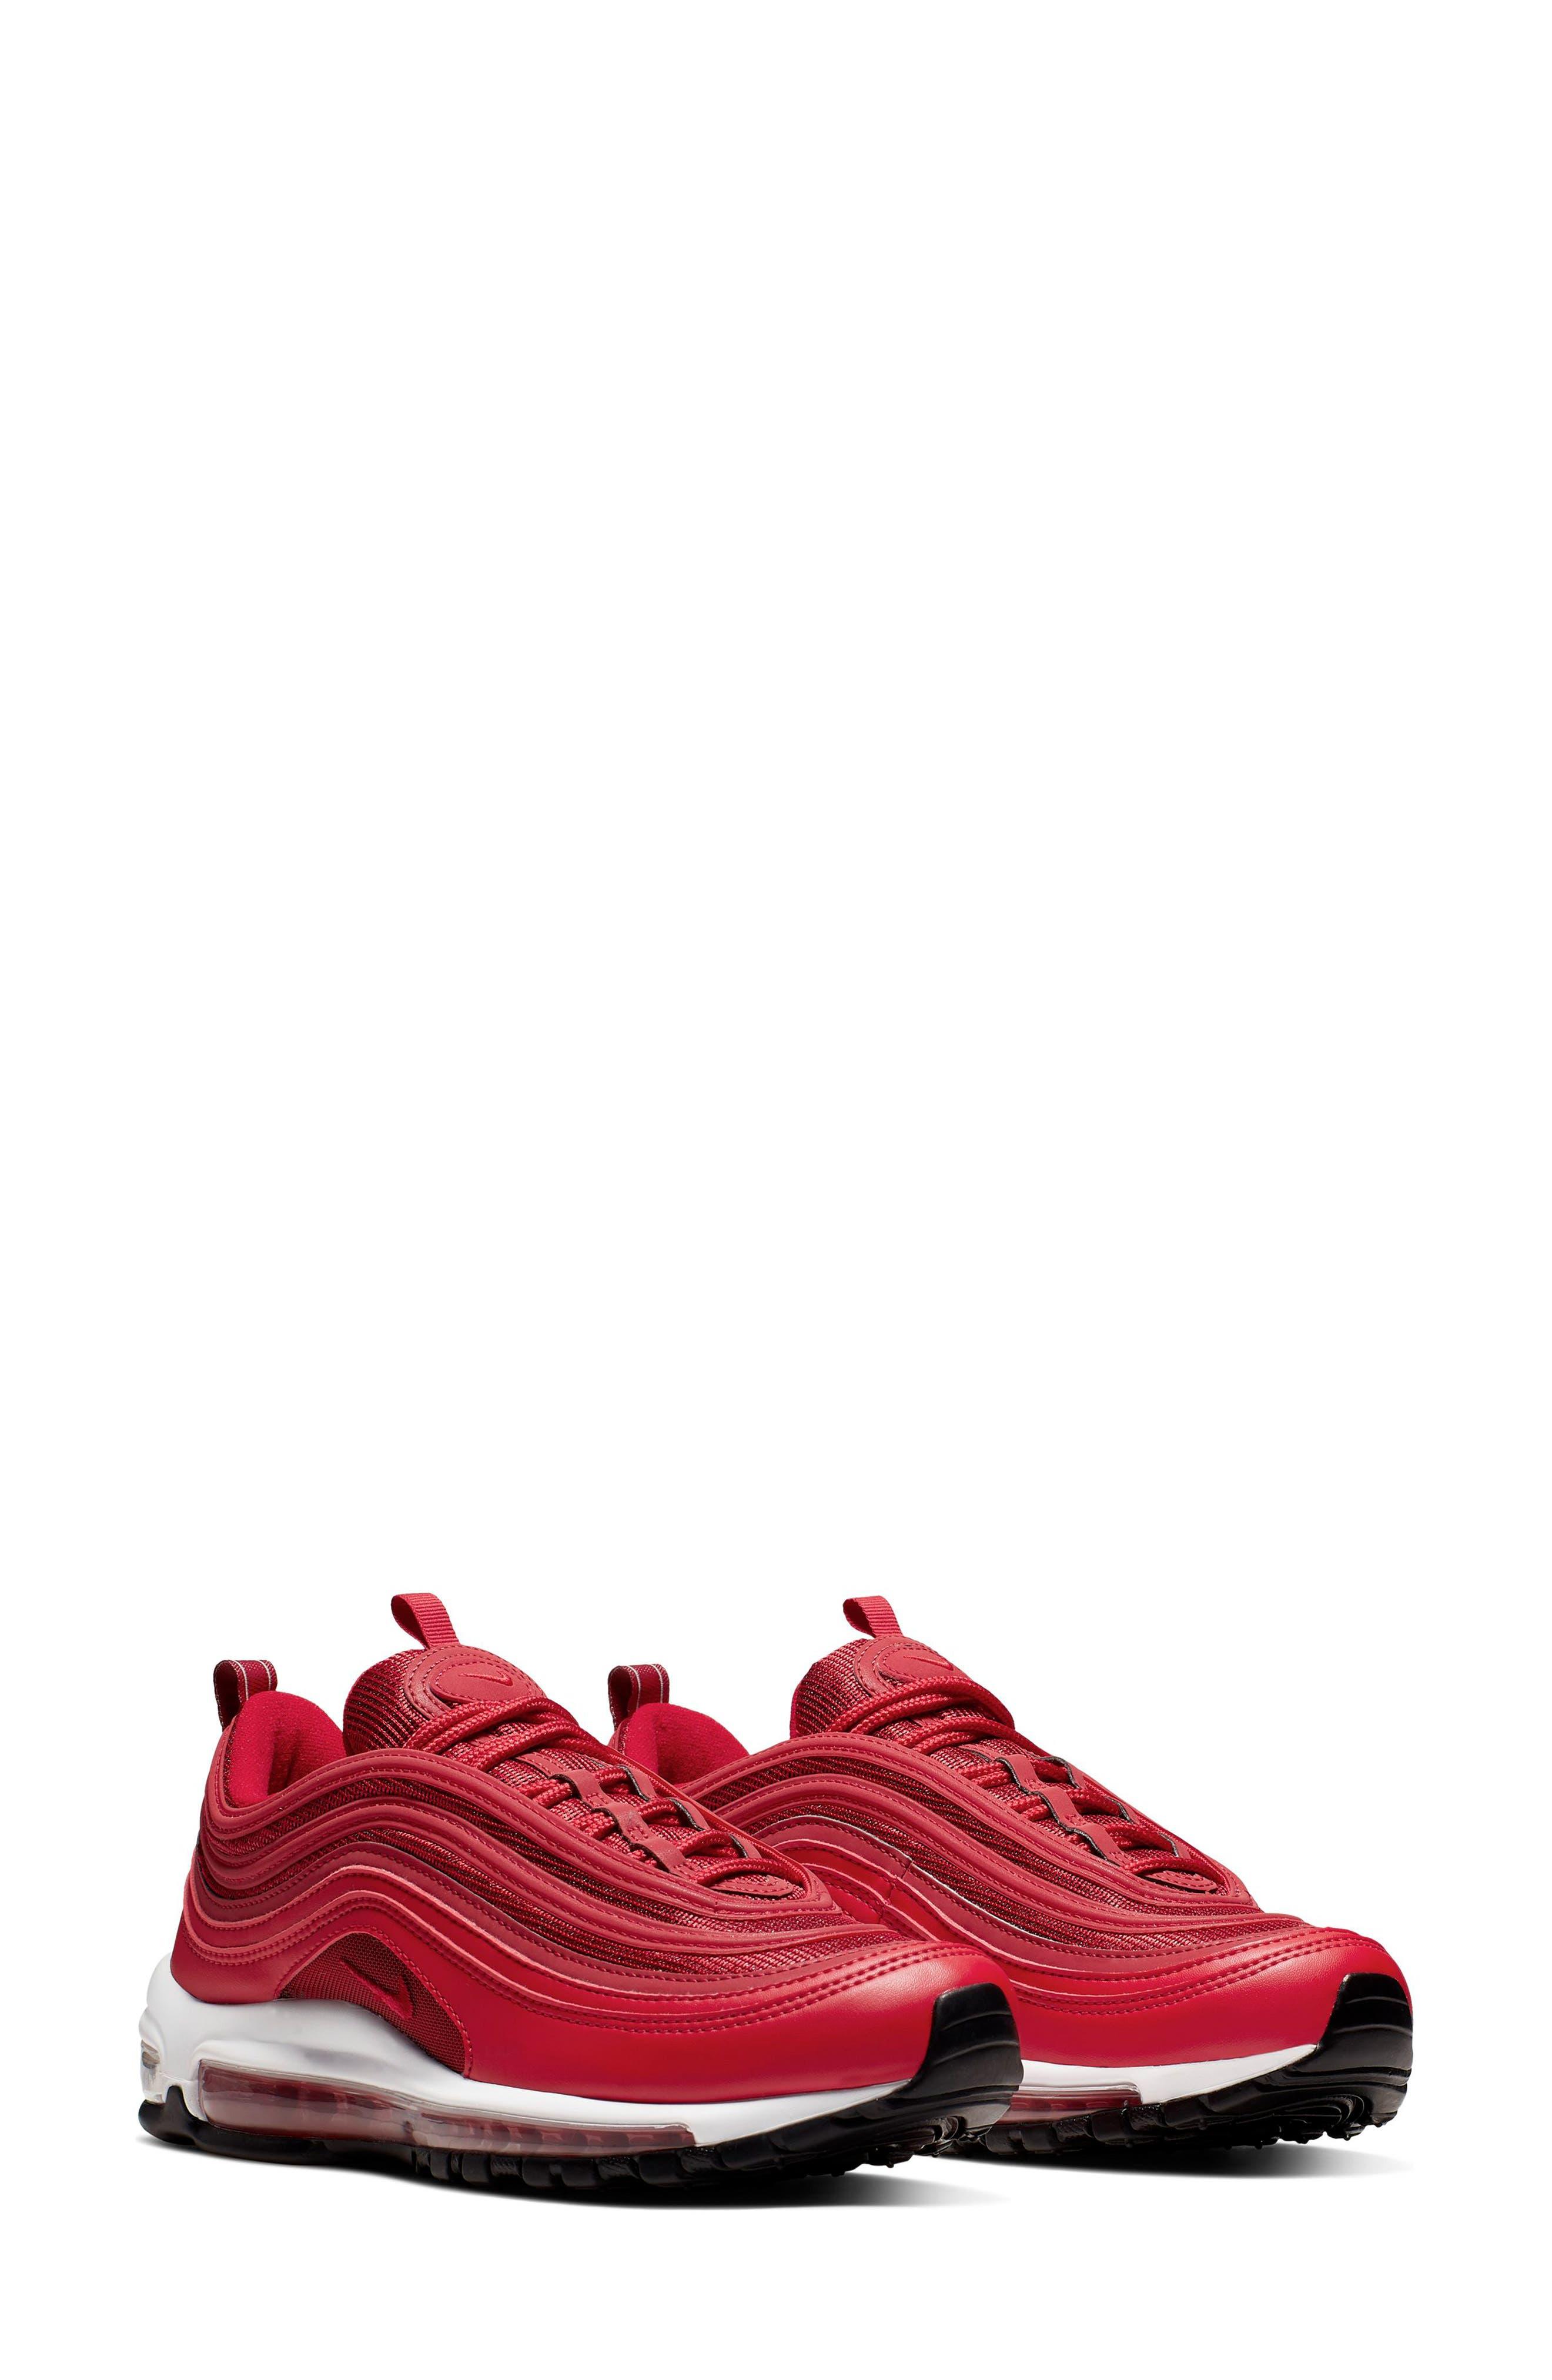 red air max womens